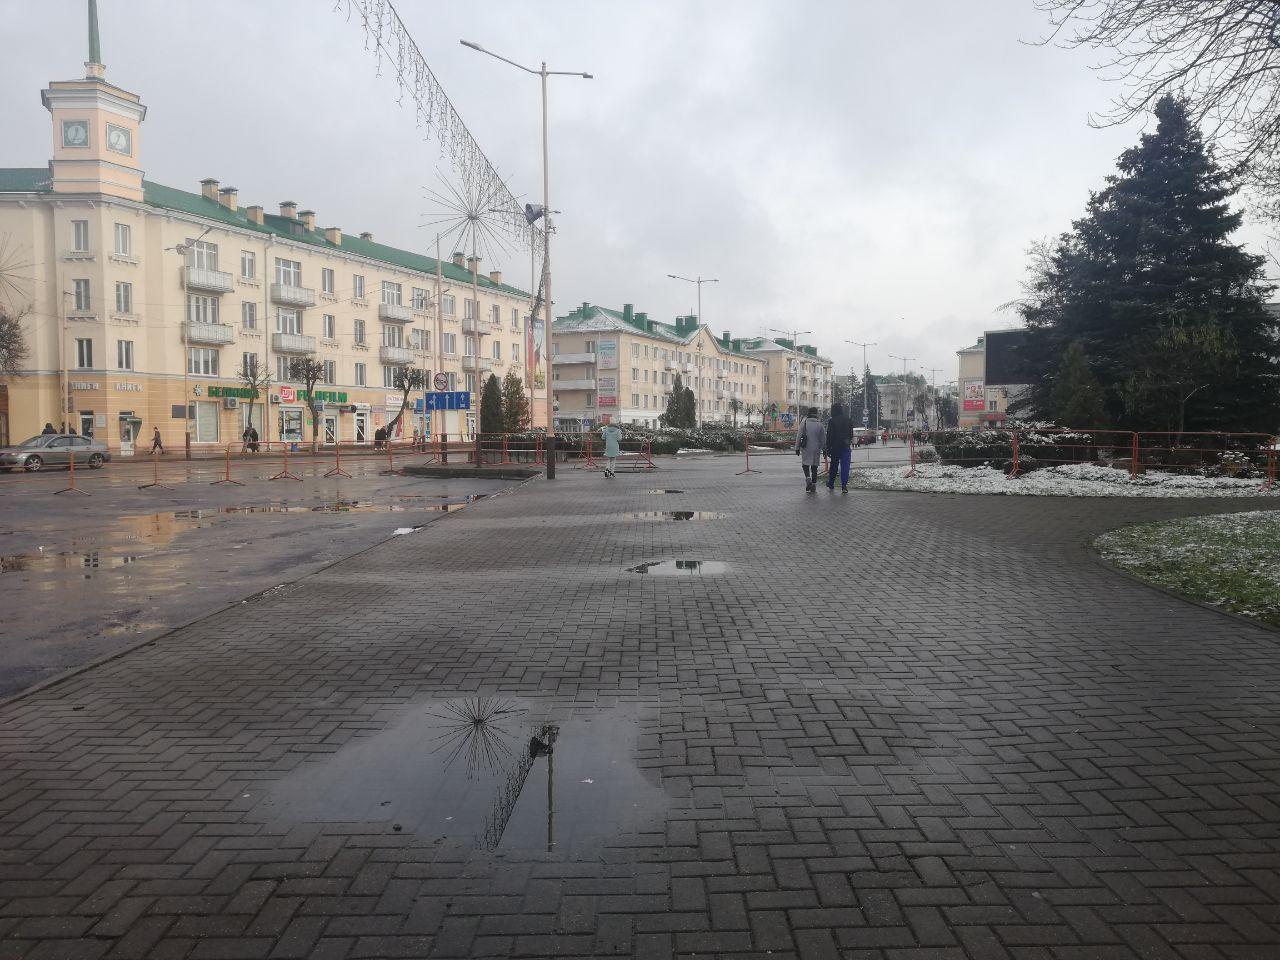 Фото: Кристина СОБИНСКАЯ